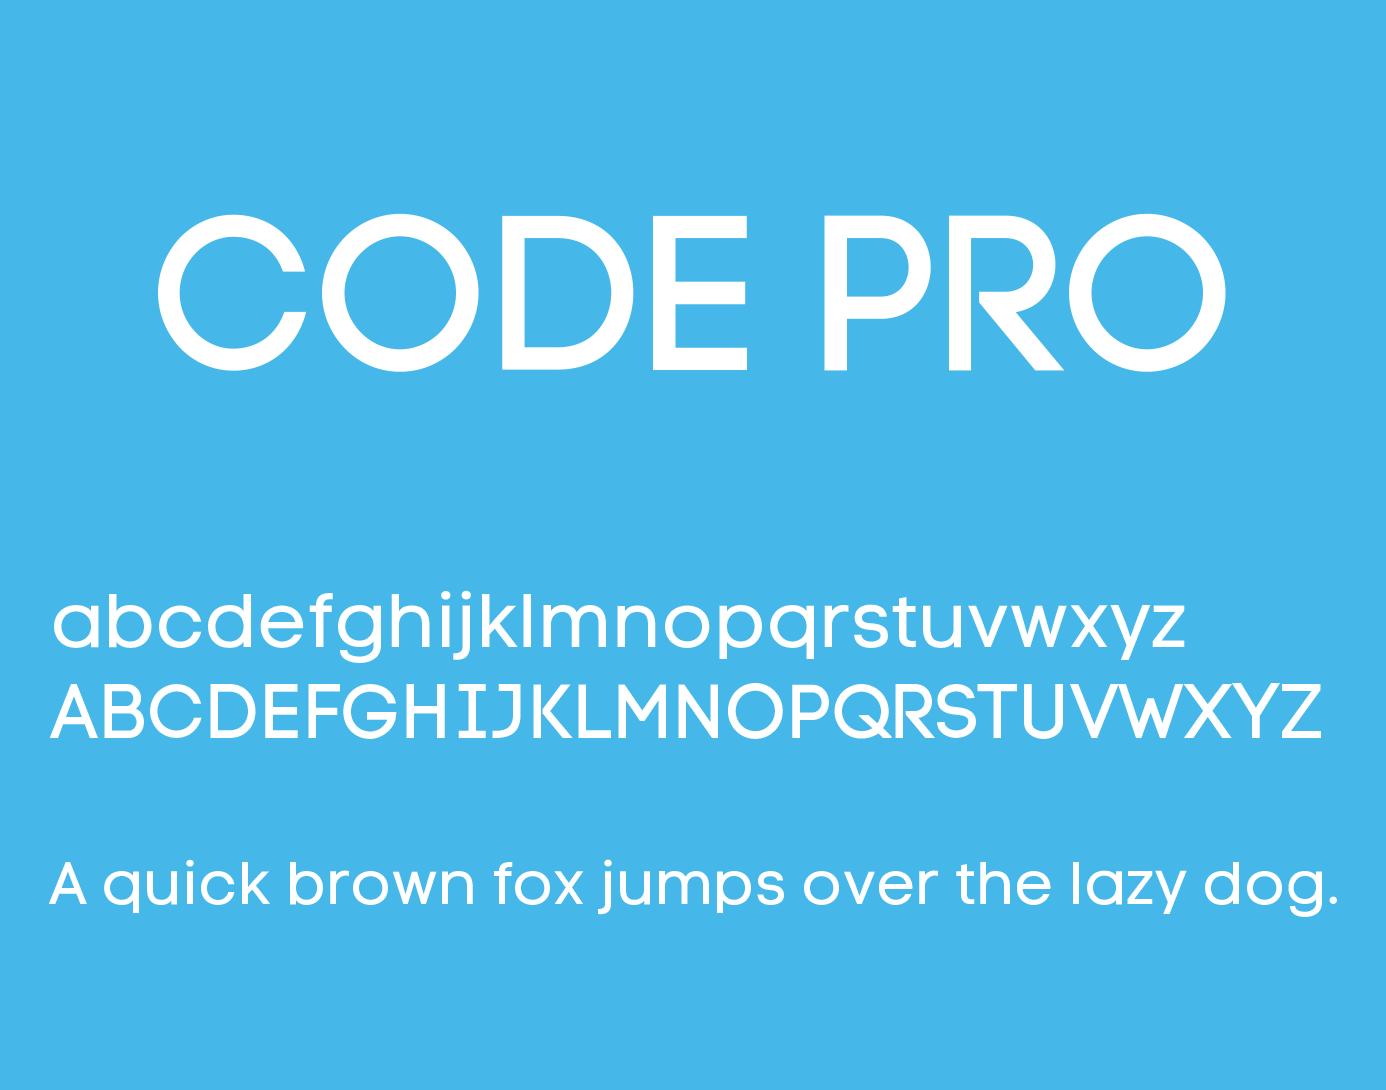 https://fontclarity.com/wp-content/uploads/2019/09/code-pro-font-download-0.png Free Download